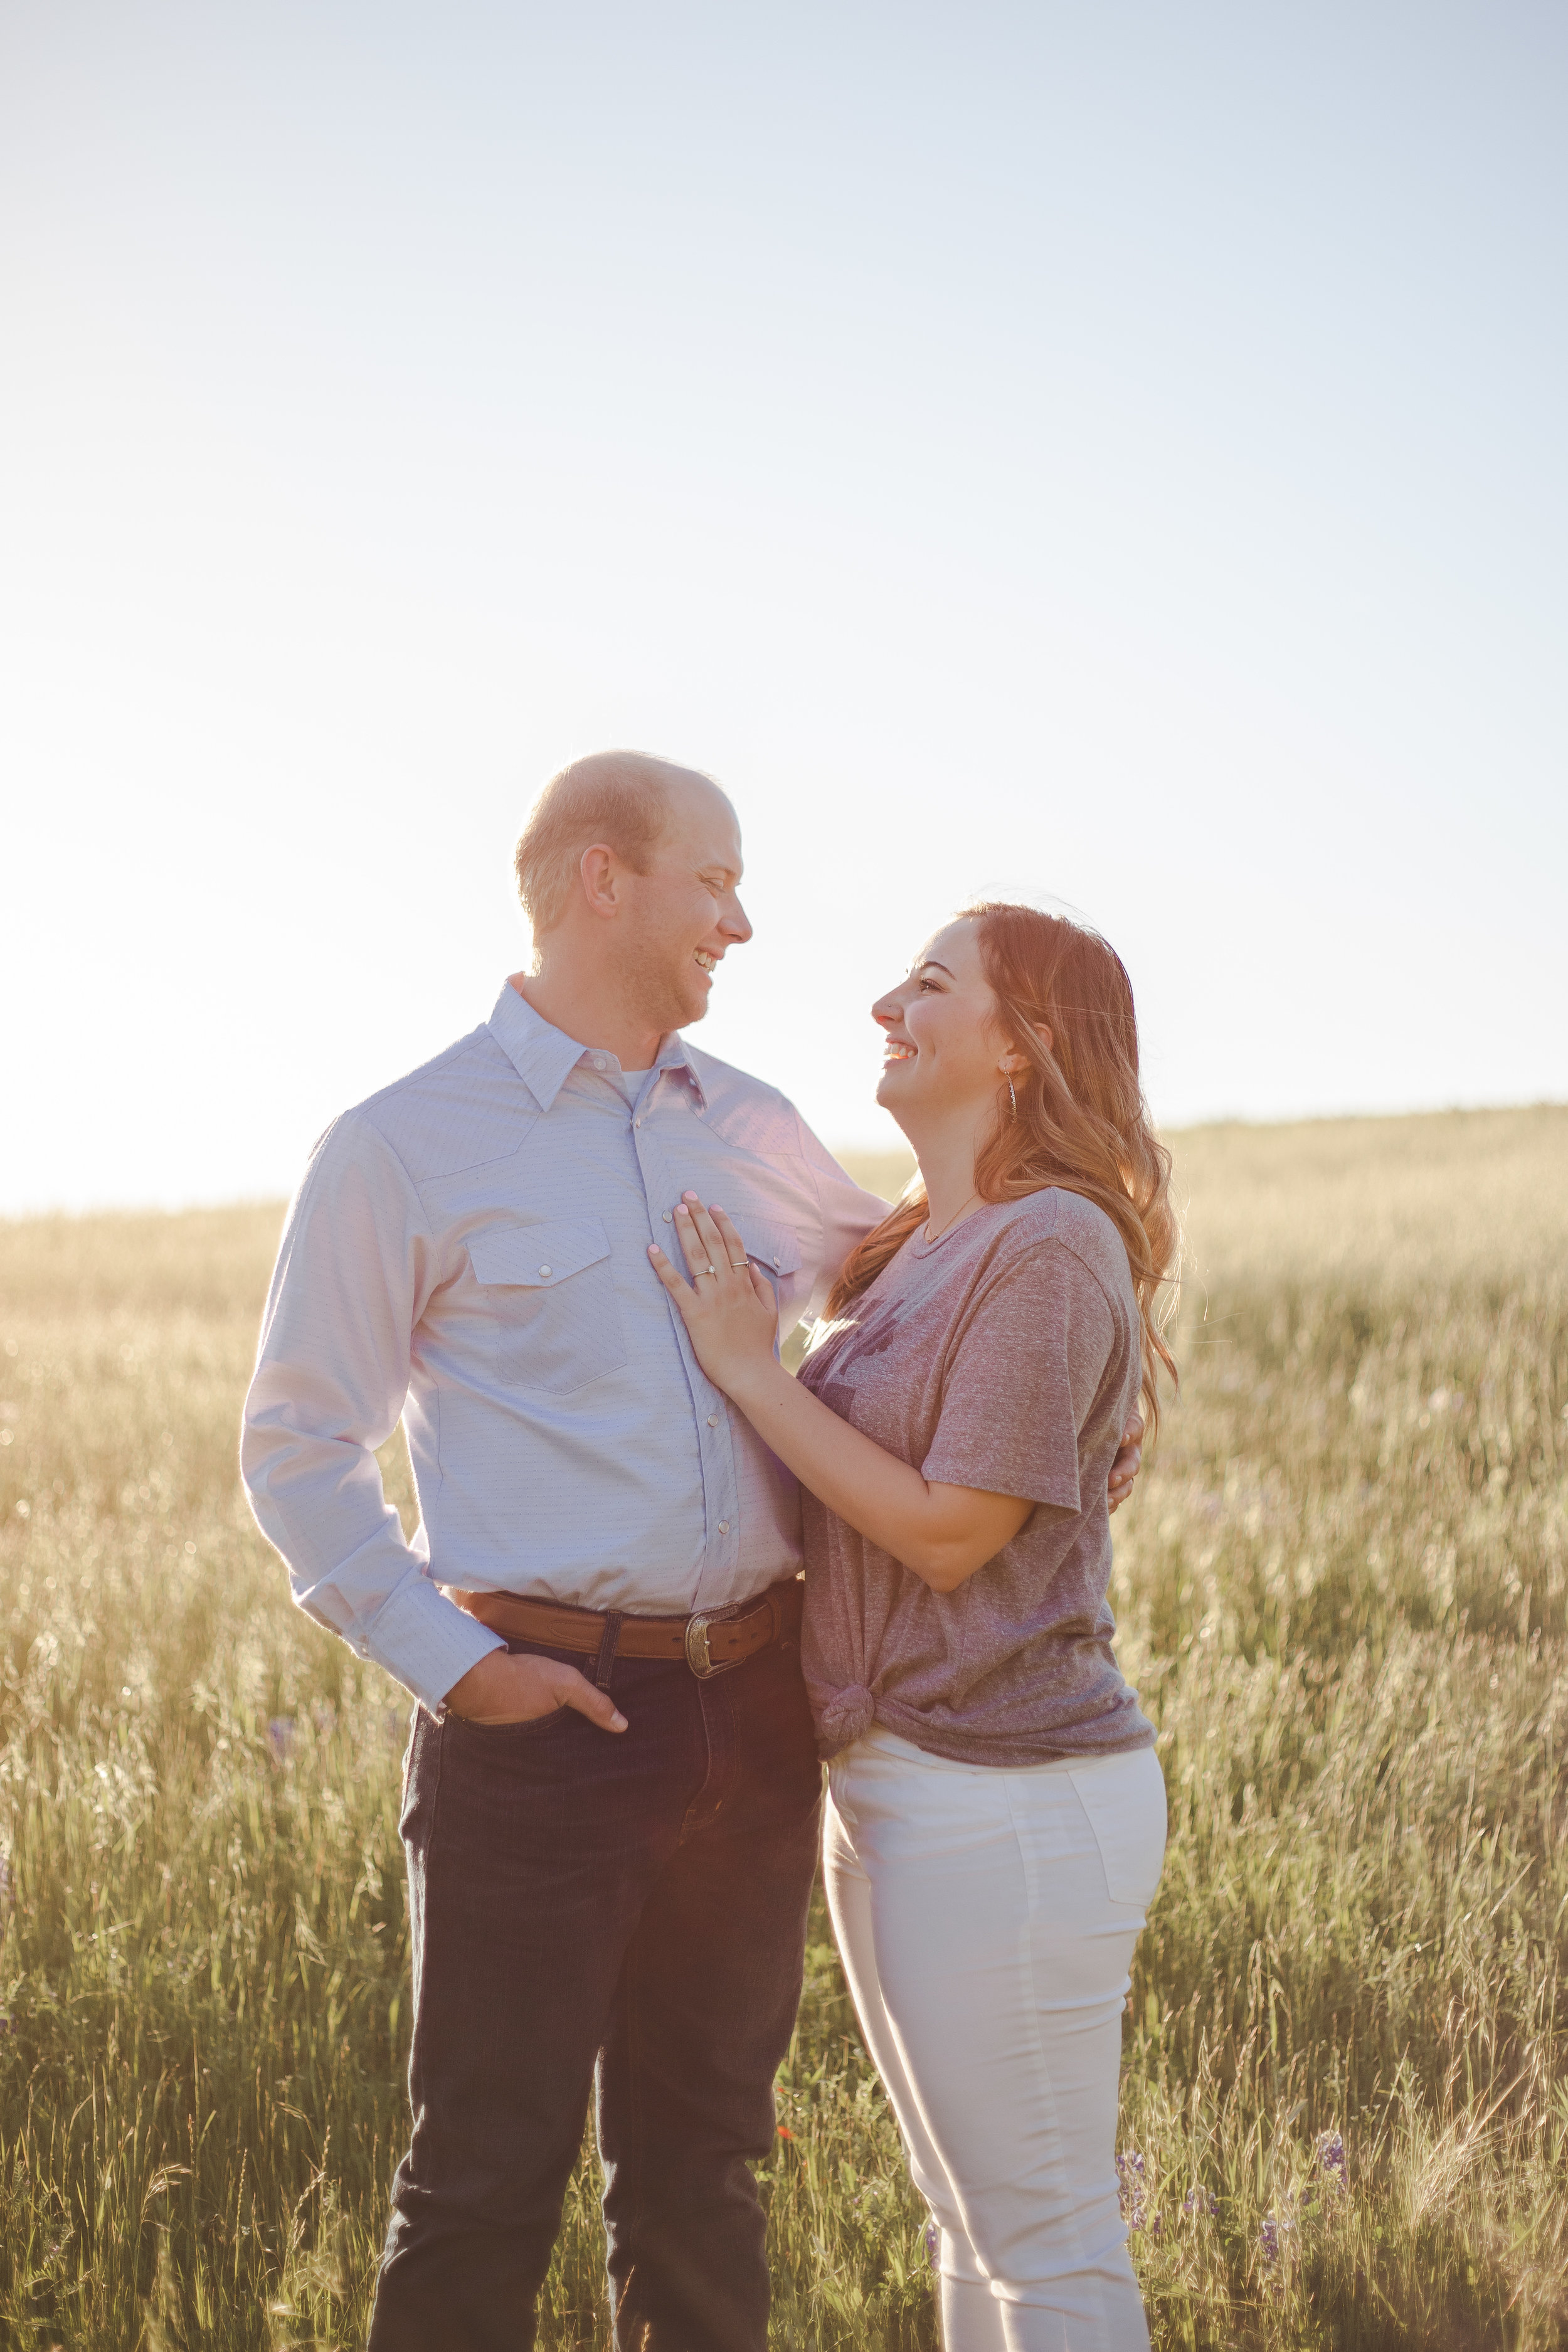 ennis texas wedding engagement photographer ellis county waxahachie midlothian bluebonnet photography